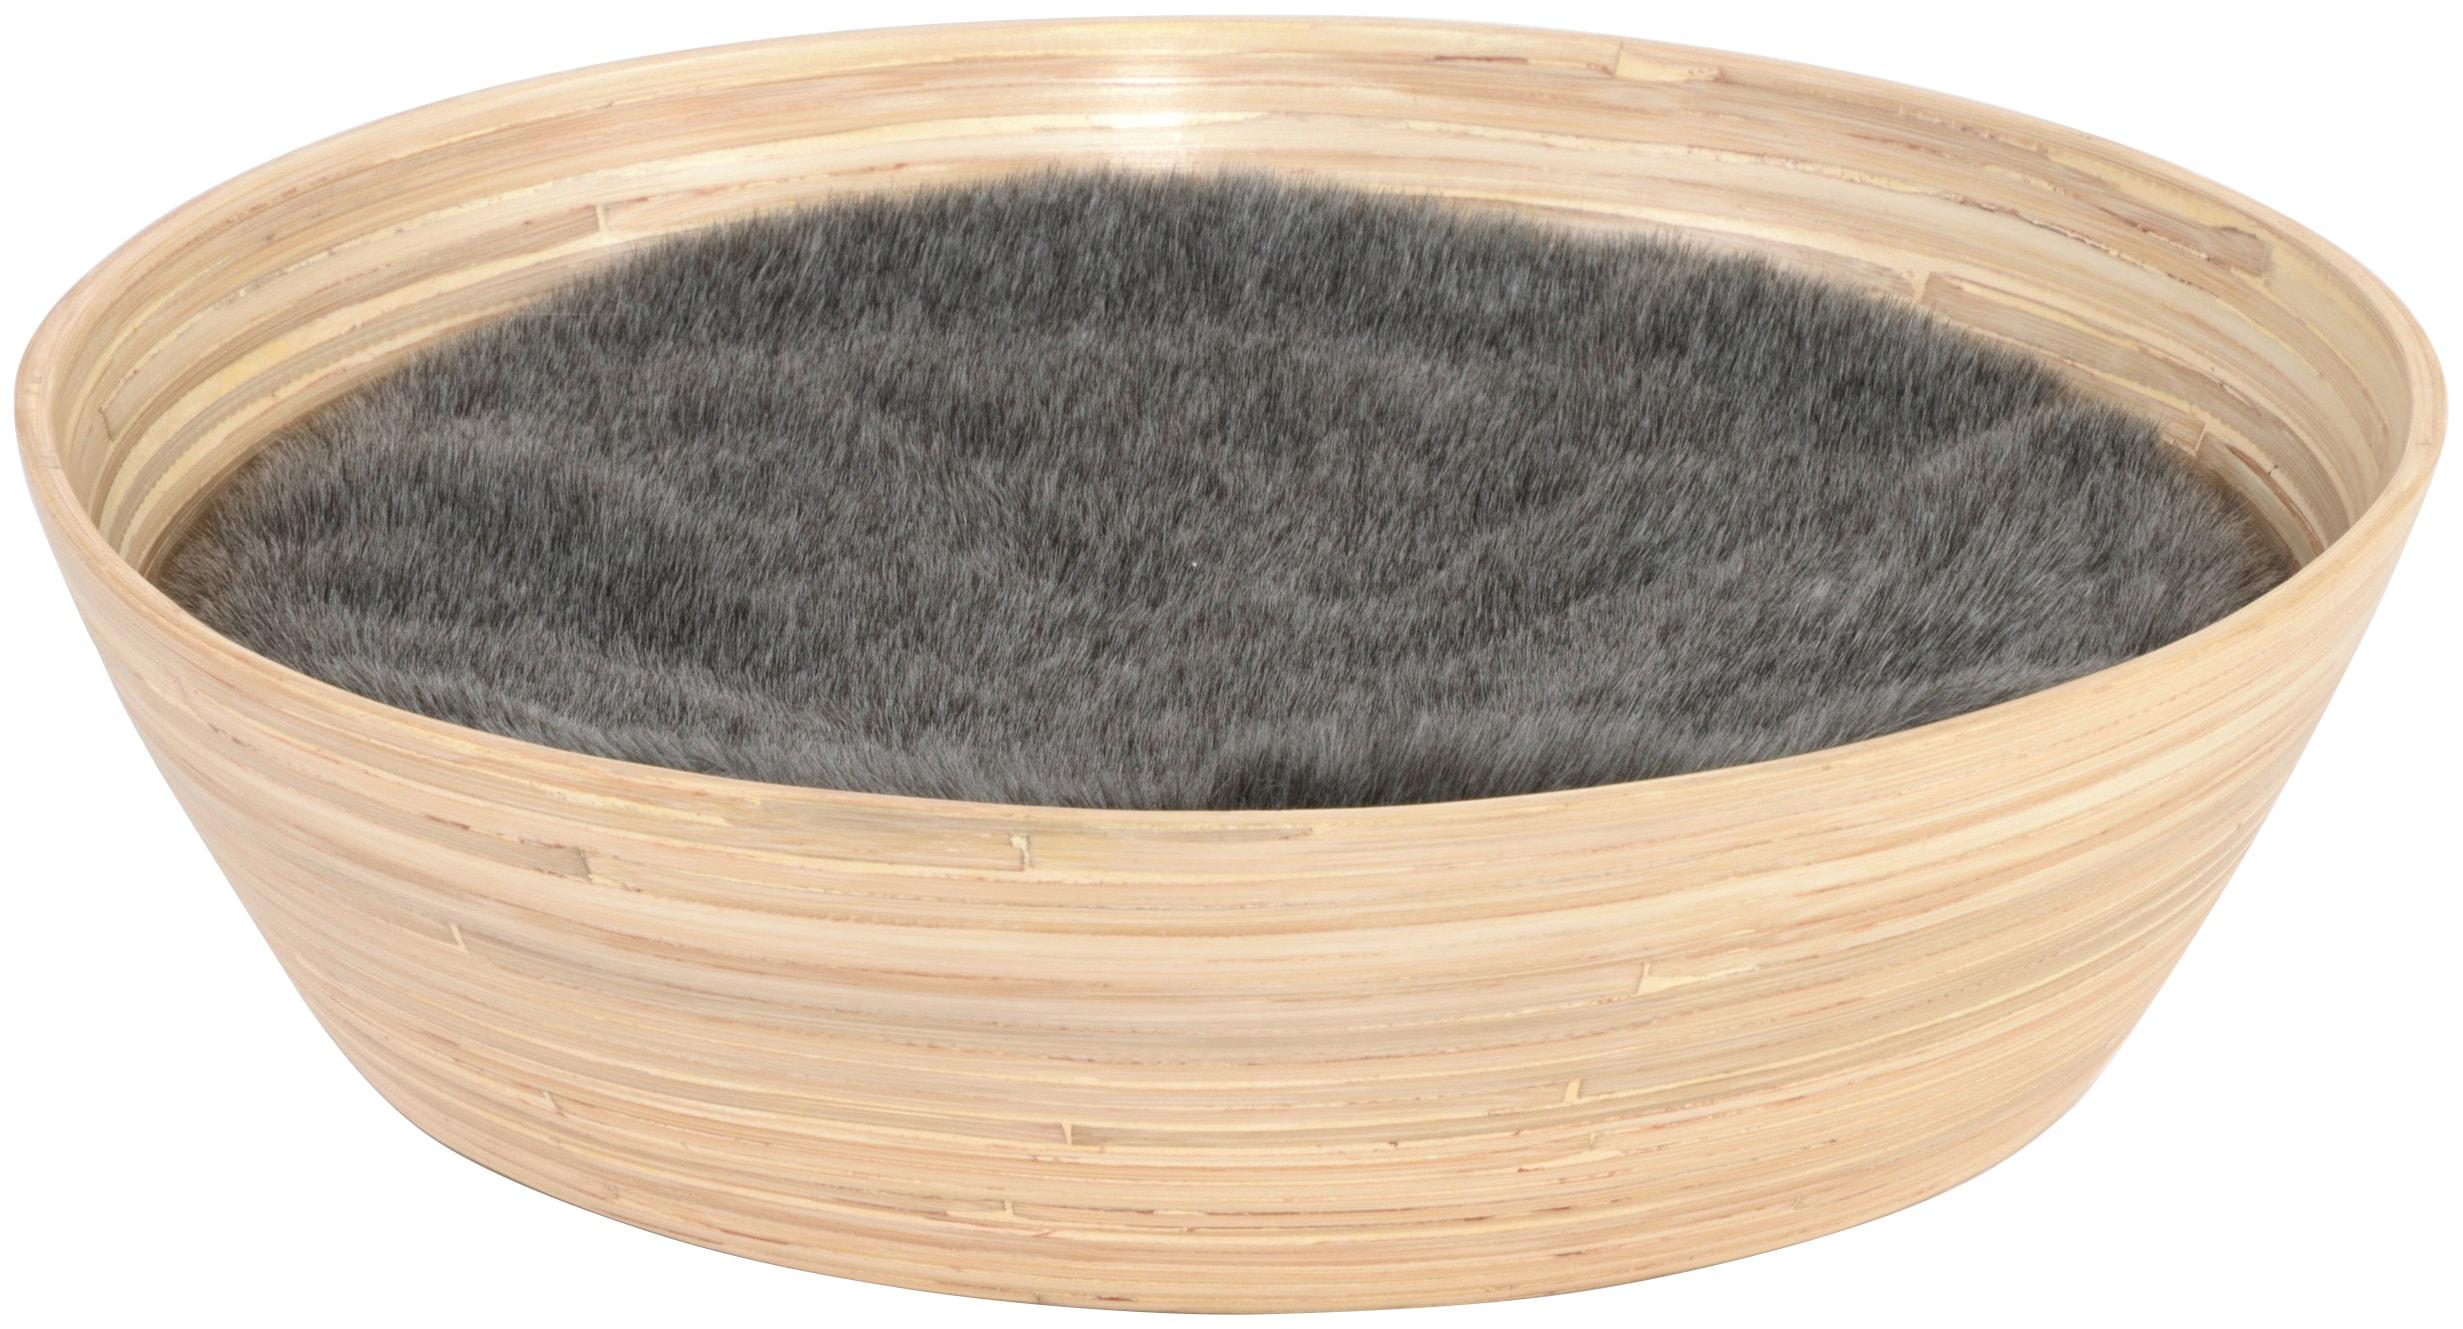 SILVIO DESIGN Katzenkorb »Ajumi Gr. 1«, B/L/H: 45/45/12 cm, natur   Garten > Tiermöbel > Katzenkörbe   Natur   SILVIO DESIGN